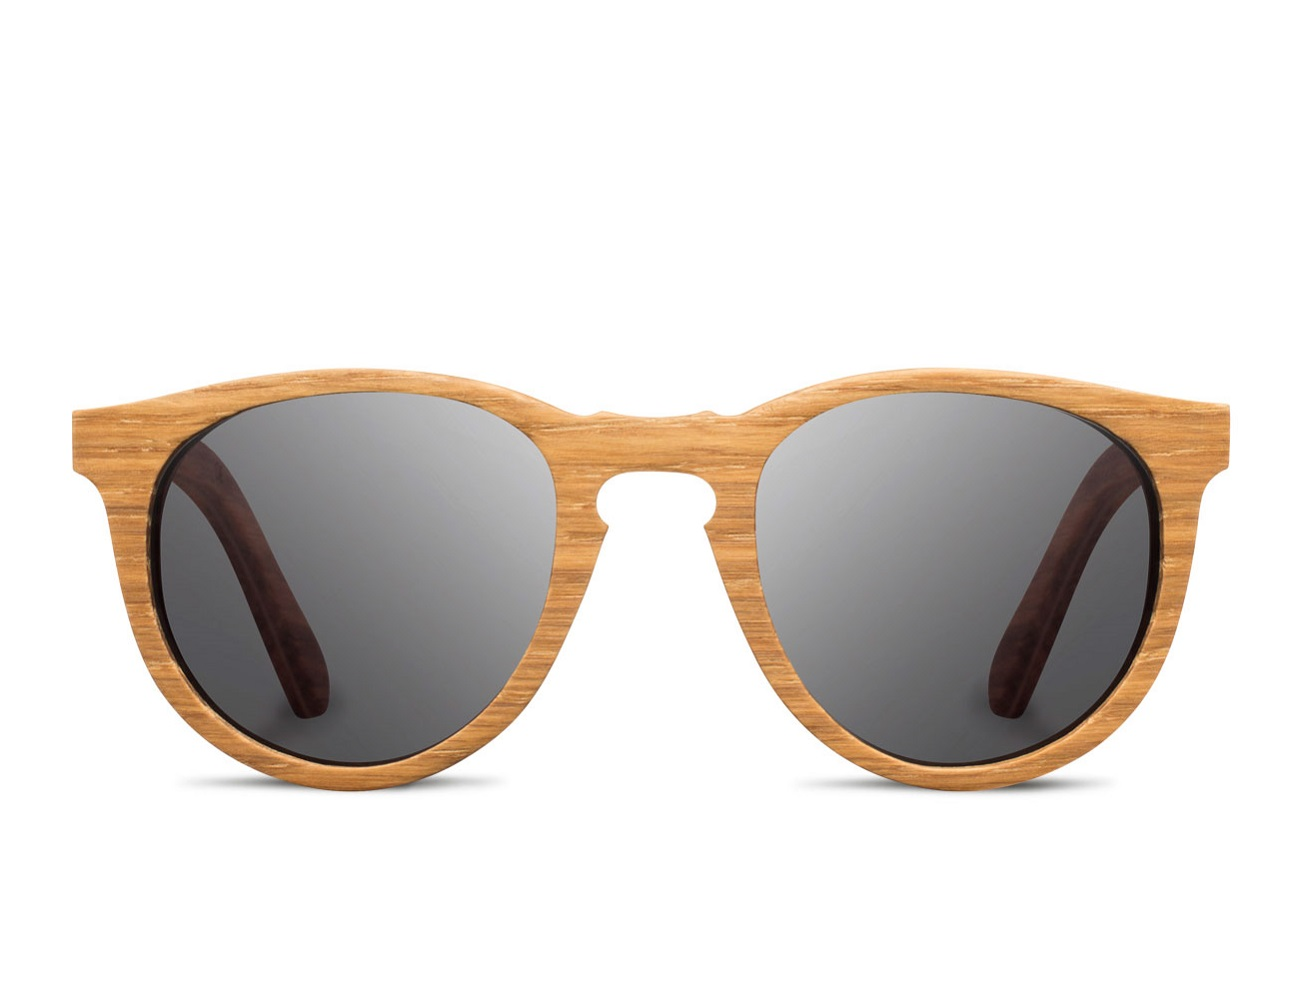 Belmont Dark Walnut and Grey Wooden Sunglasses